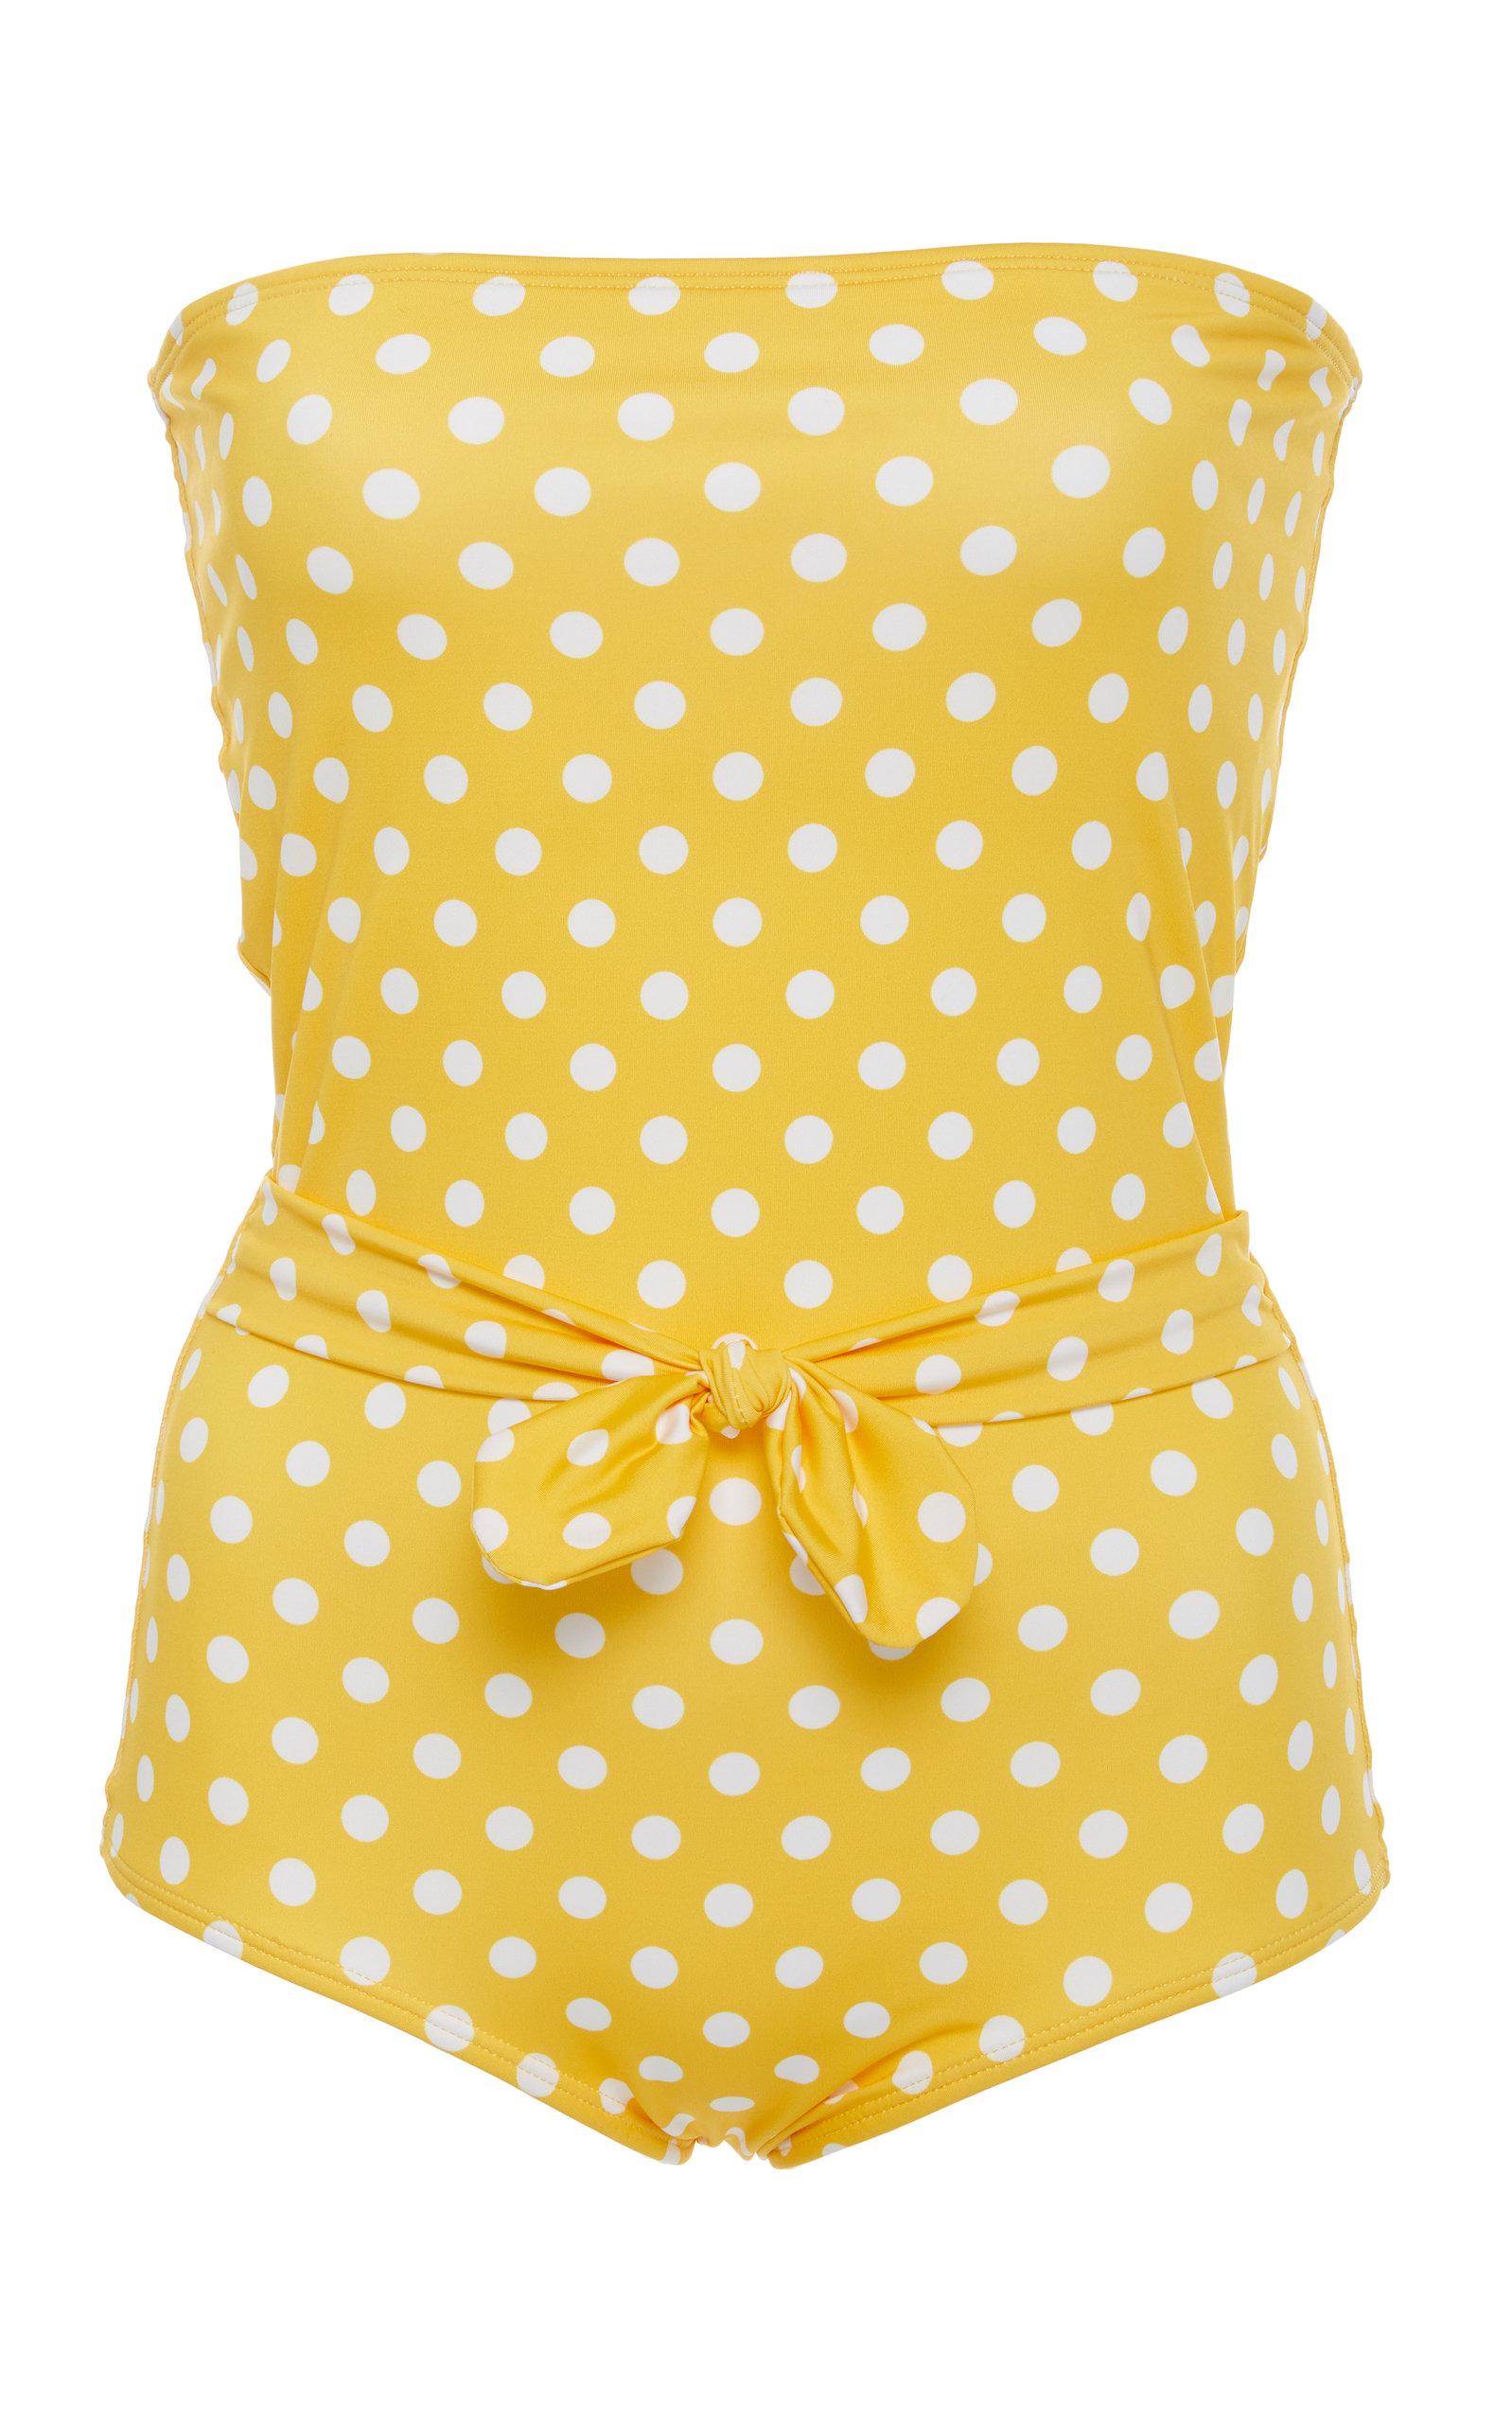 VERDELIMON Porto Strapless One Piece Swimsuit in Yellow